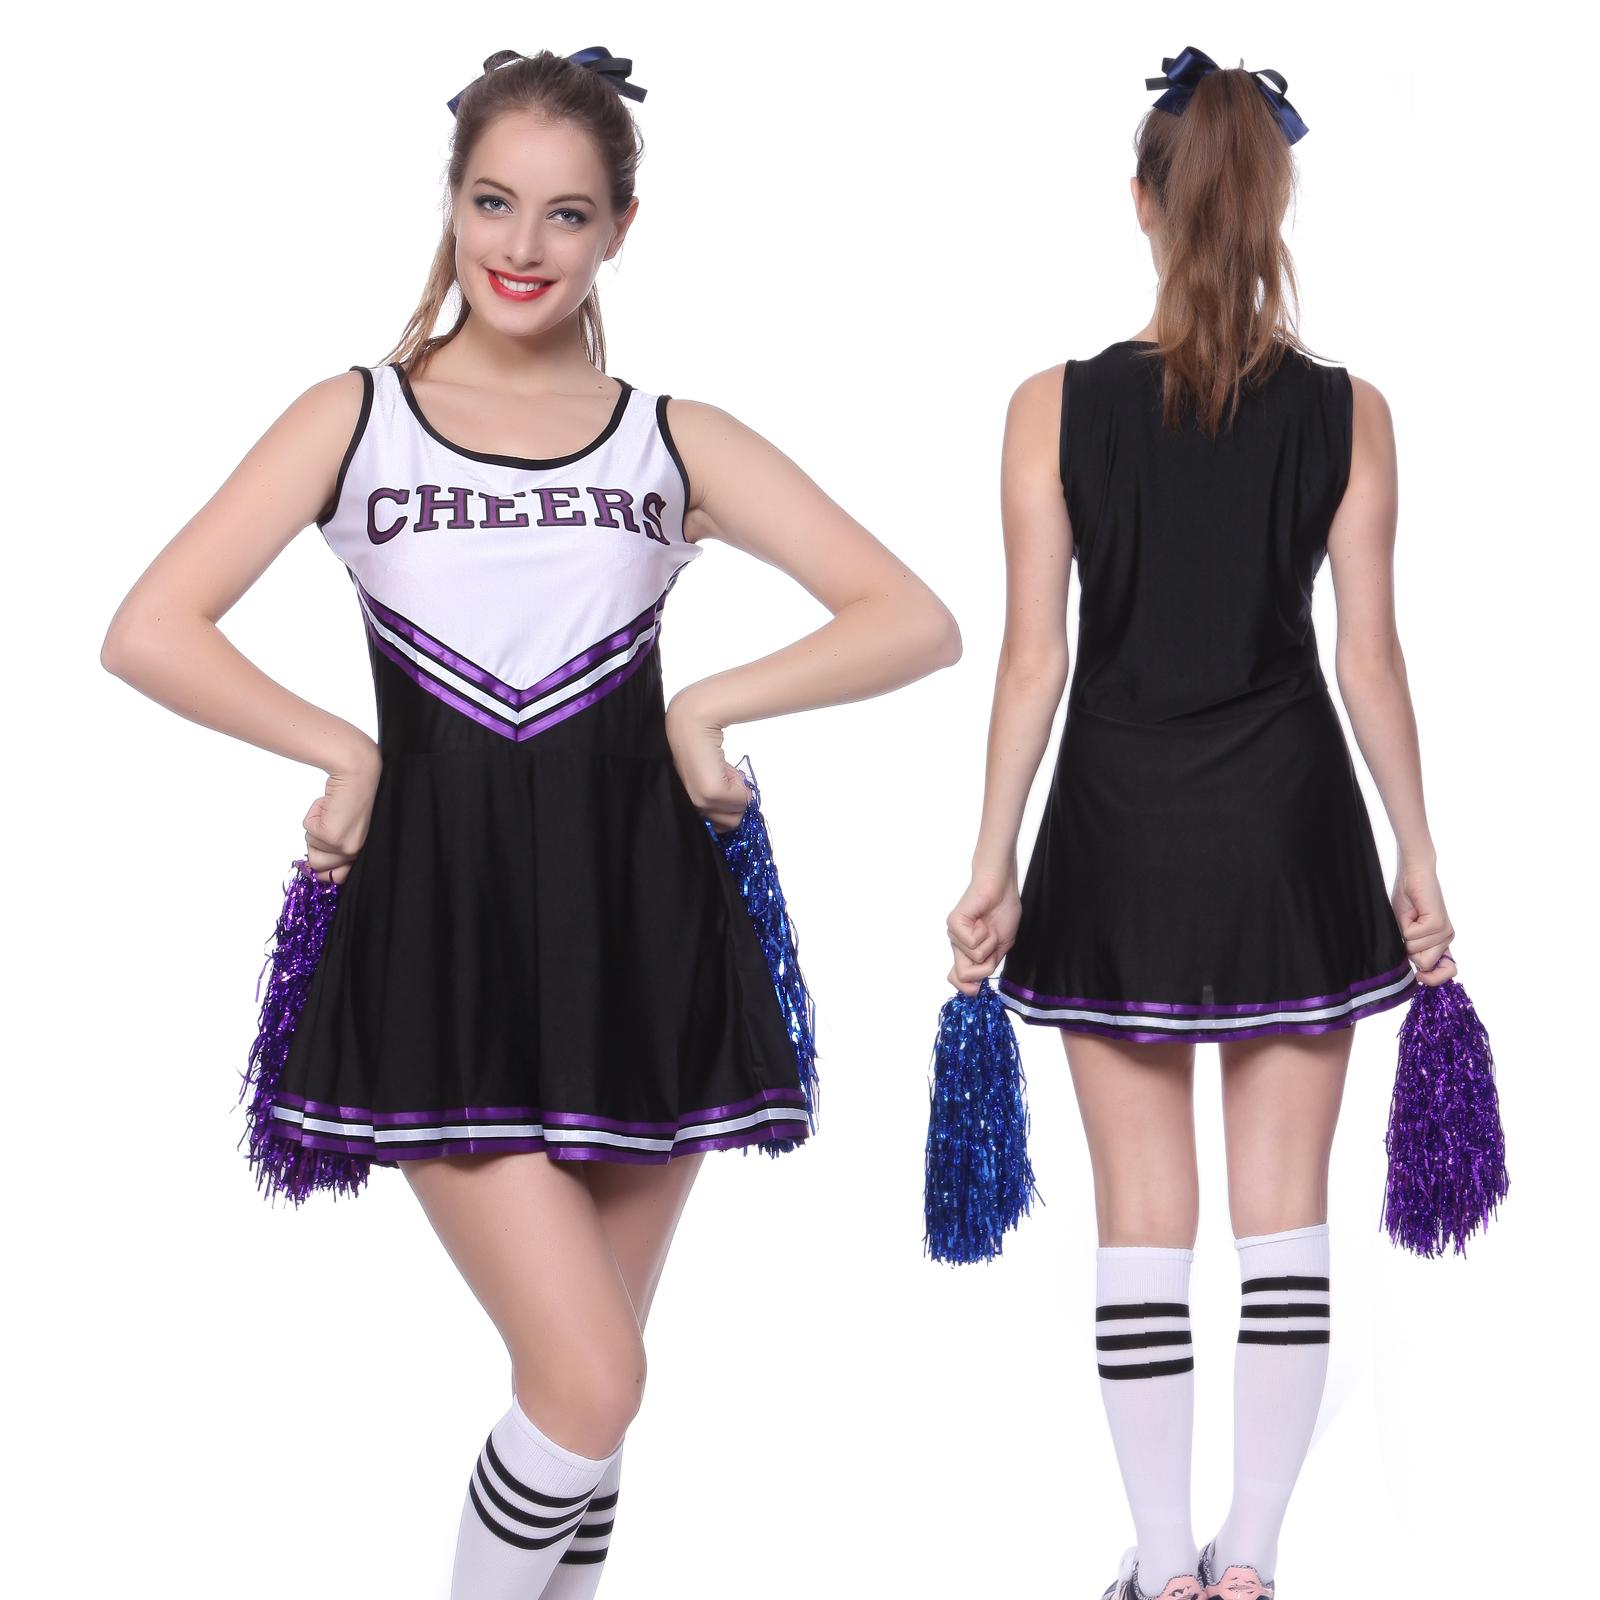 Glee Cheerleader Costume School Girls Fancy Outfits Dress Uniform